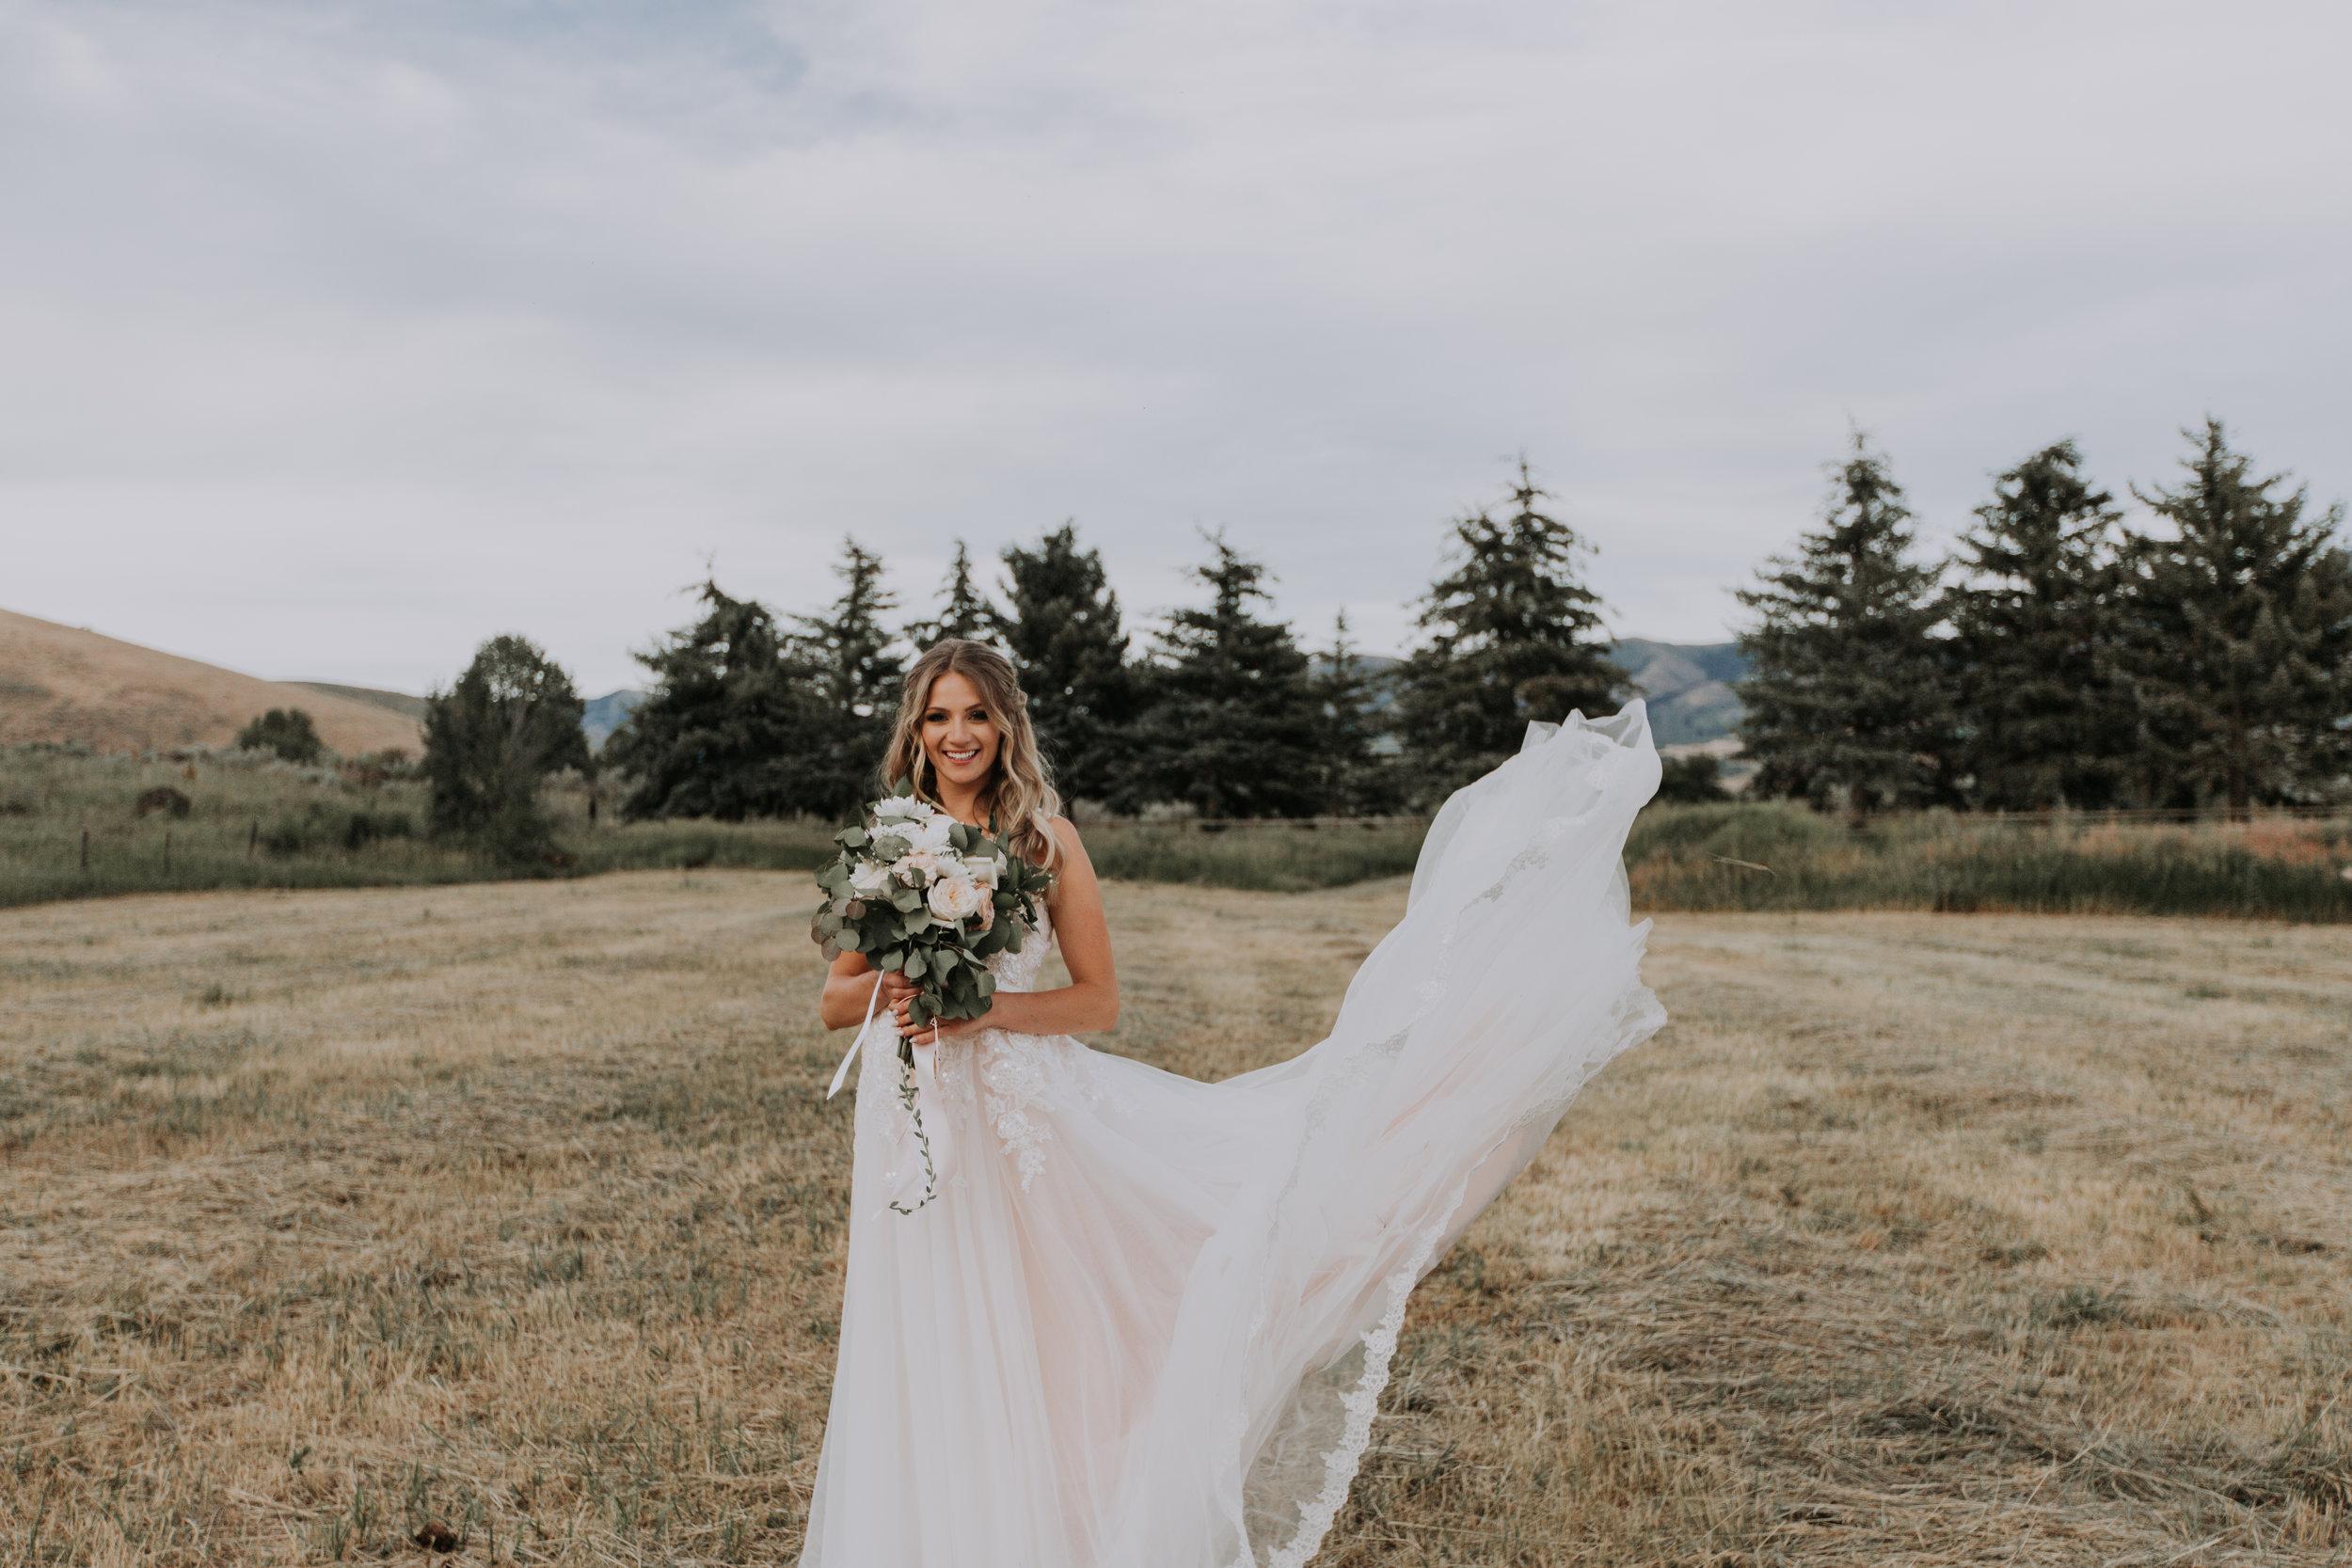 Inkom-wedding- Photographer2.jpg